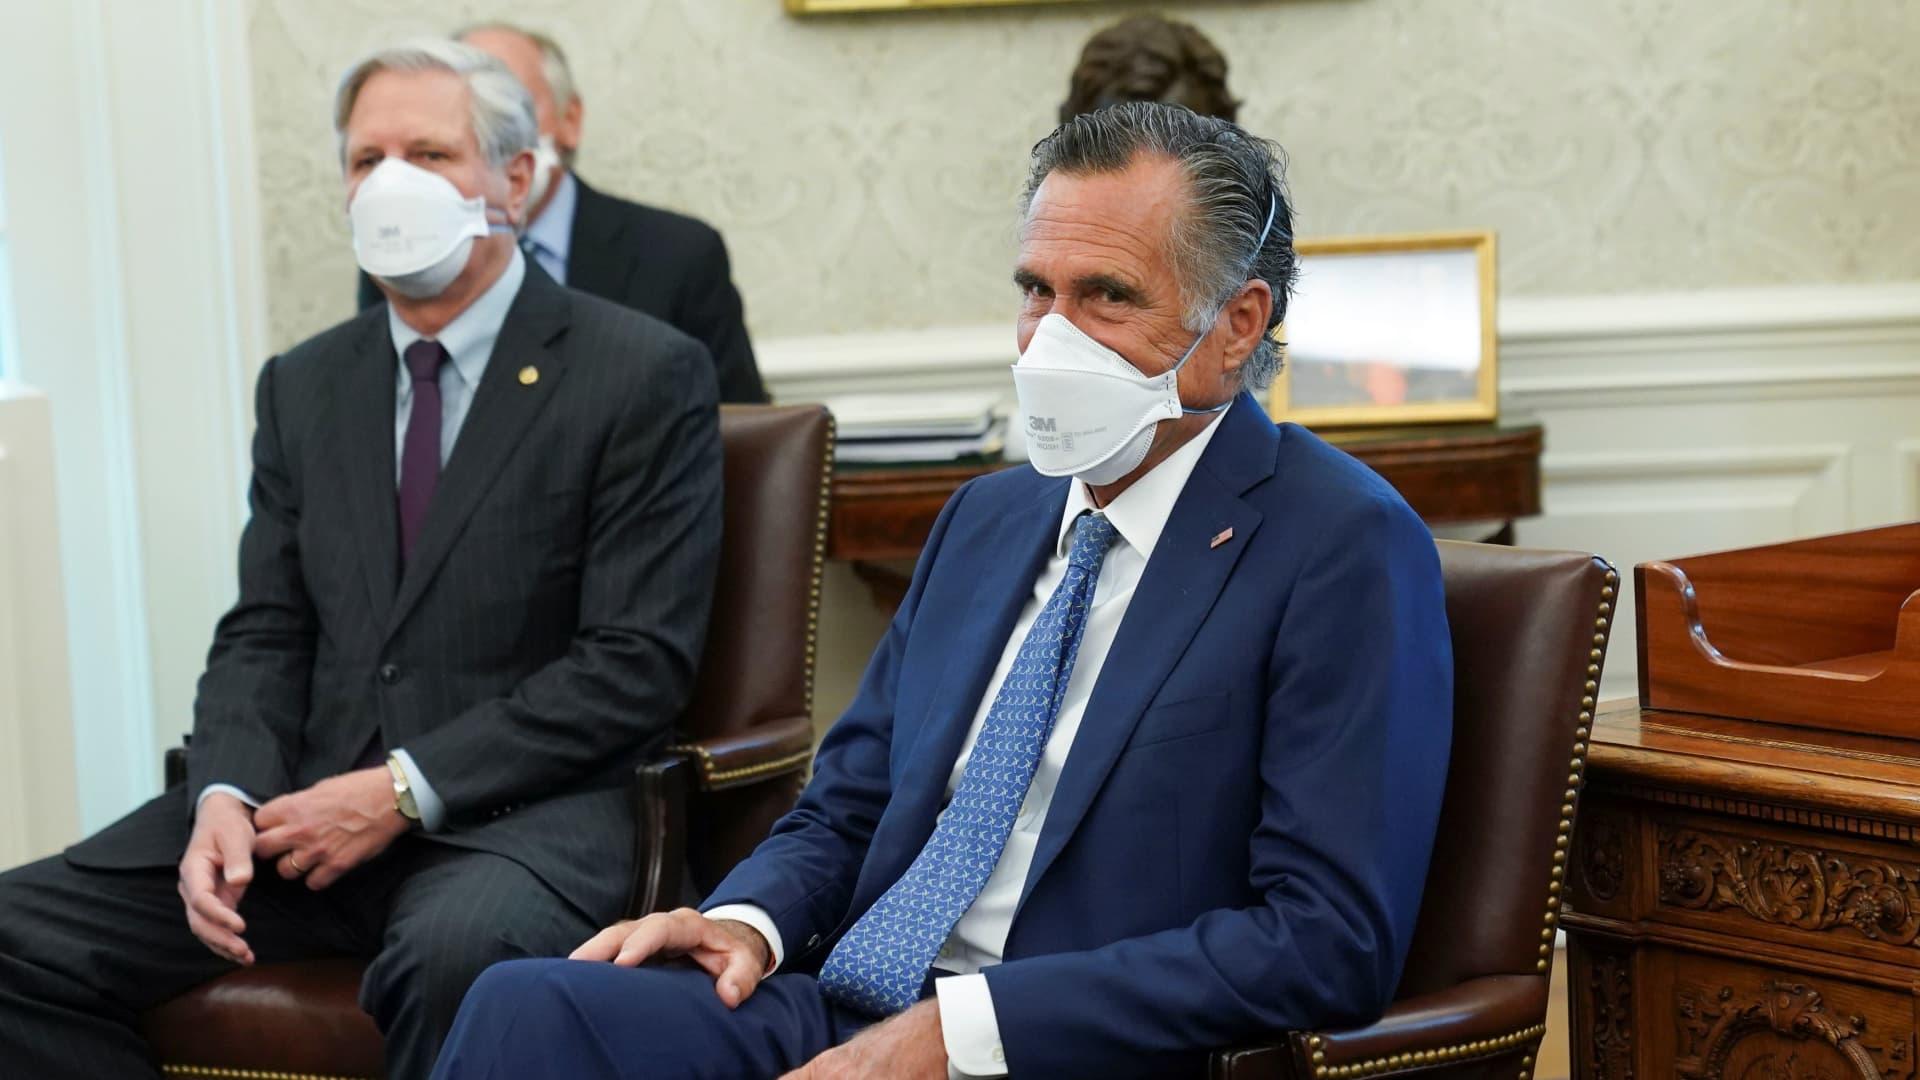 Senators Mitt Romney (R-UT) and John Hoeven (R-ND) listen as U.S. President Joe Biden holds a bi-partisan meeting on the American Jobs Plan at the White House in Washington, U.S., April 19, 2021.